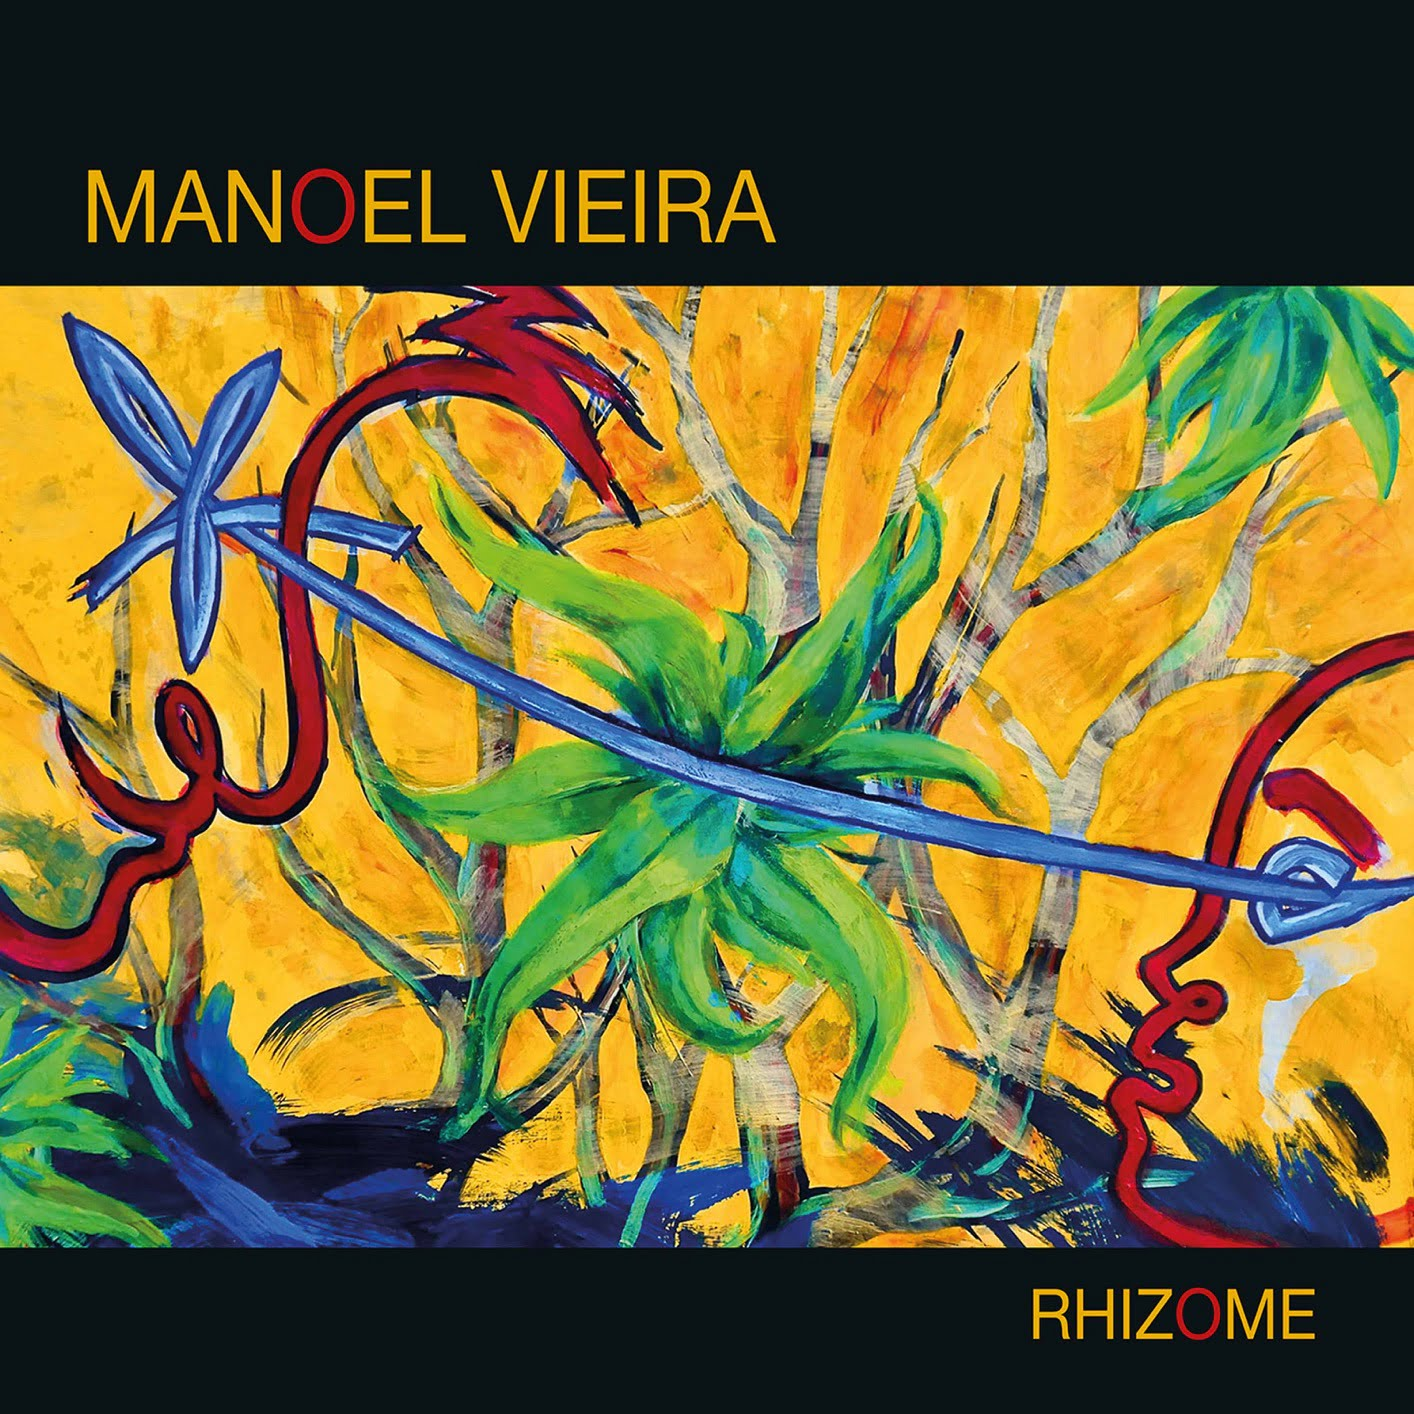 l'album Rhizome de Manoel Vieira